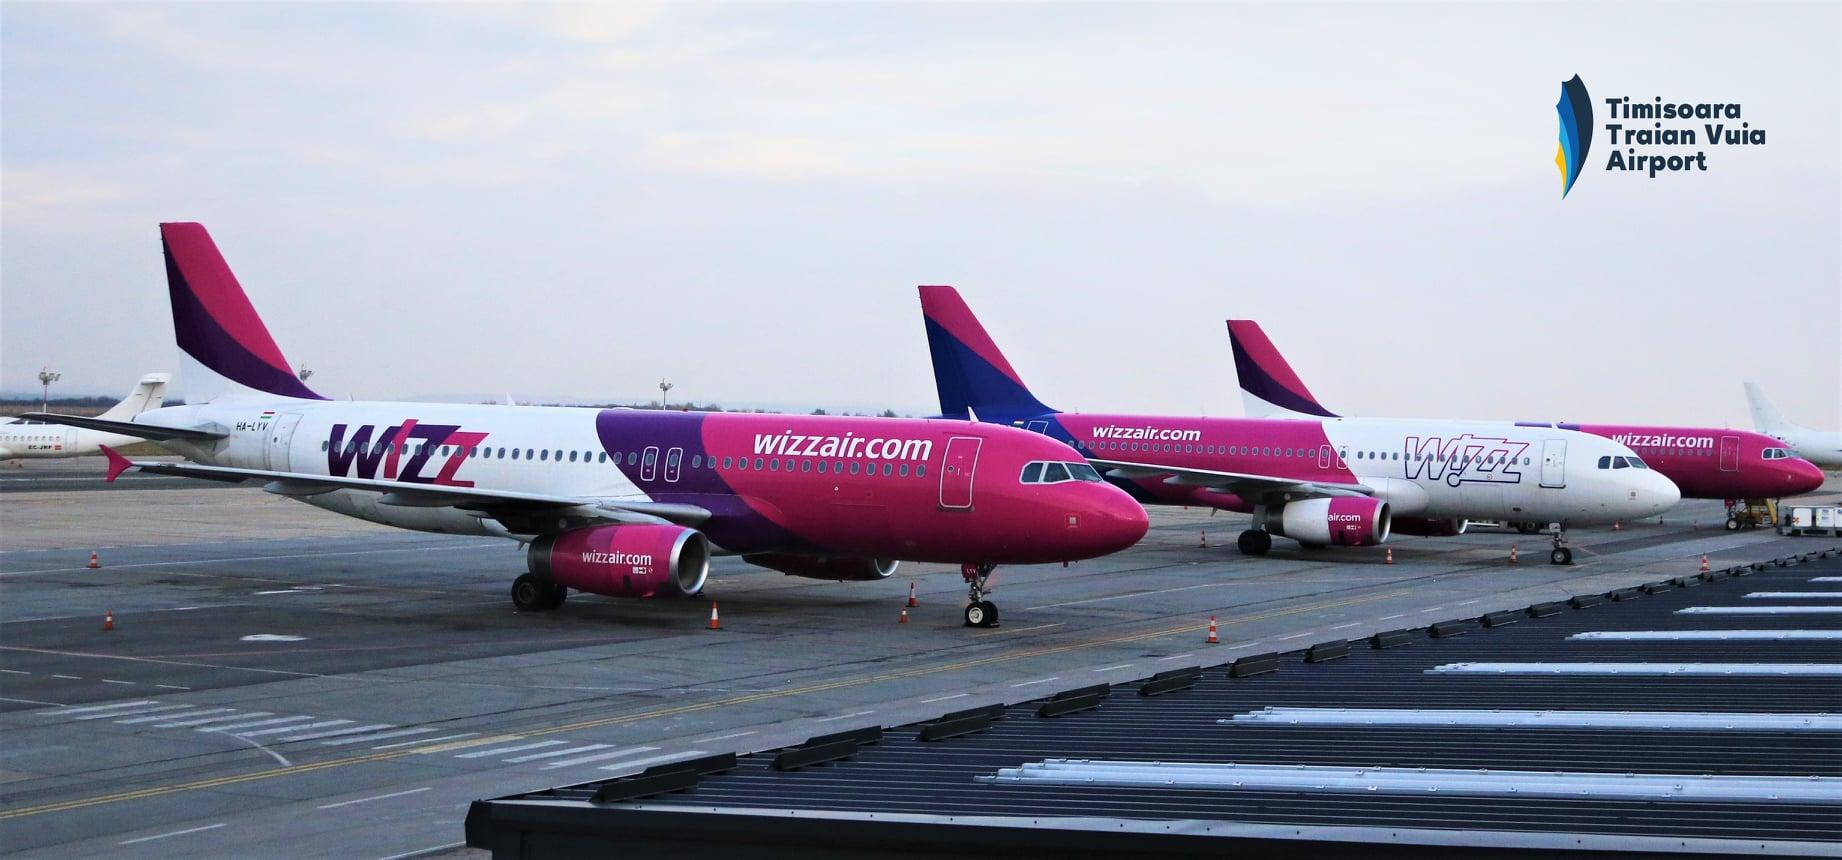 zboruri-wizz-air-timisoara-spania-belgia-anglia-iulie